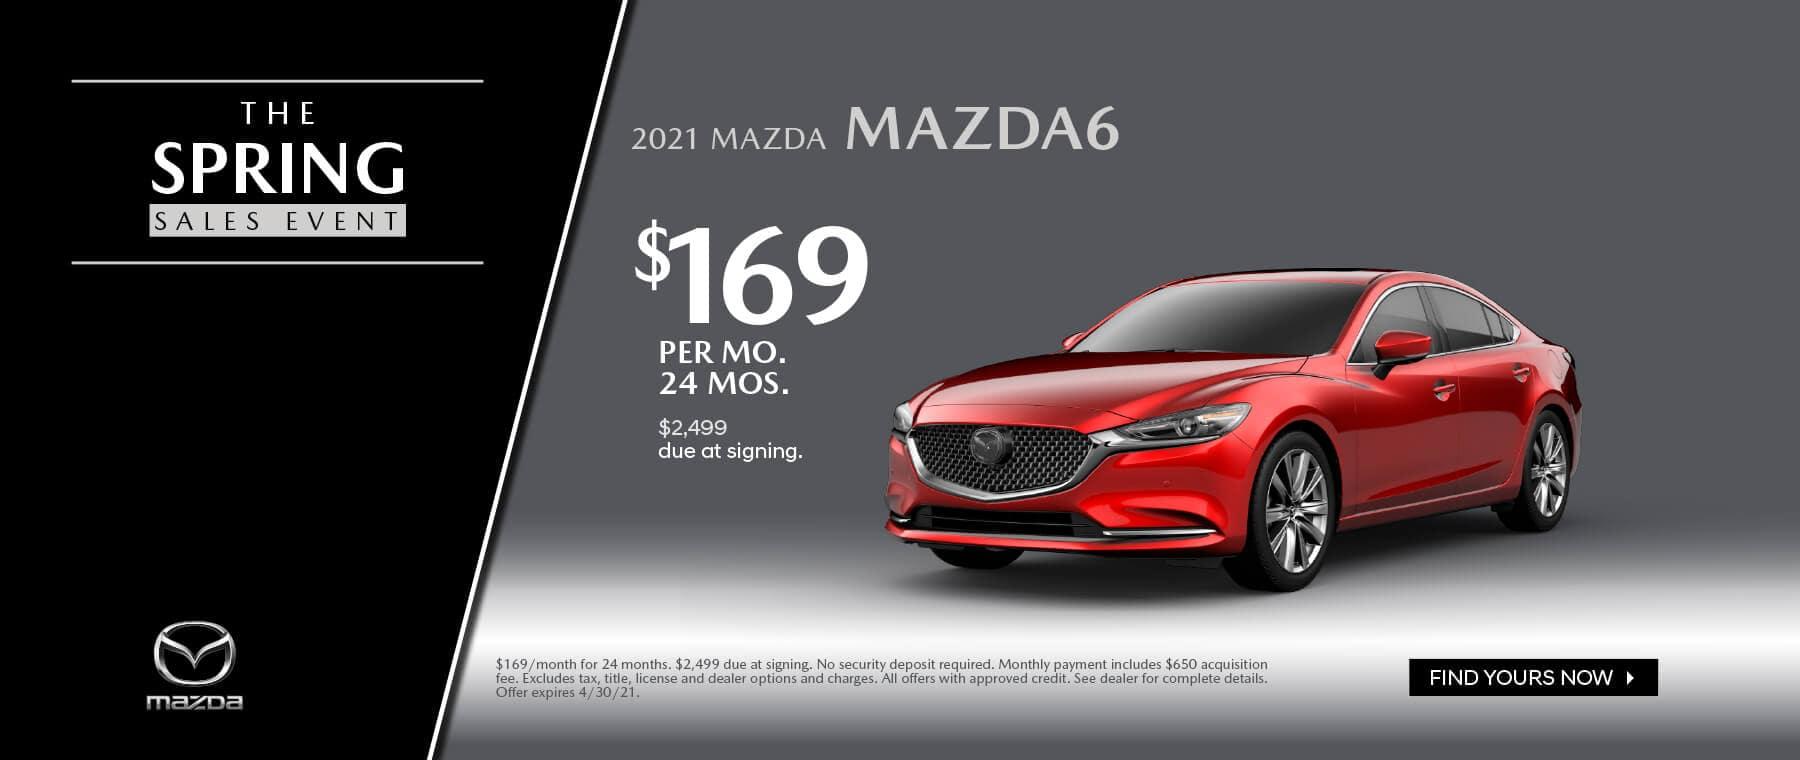 2021.04.15-Keffer-Mazda-APR-Web-Banner-Offer-Update-S51838vw-5